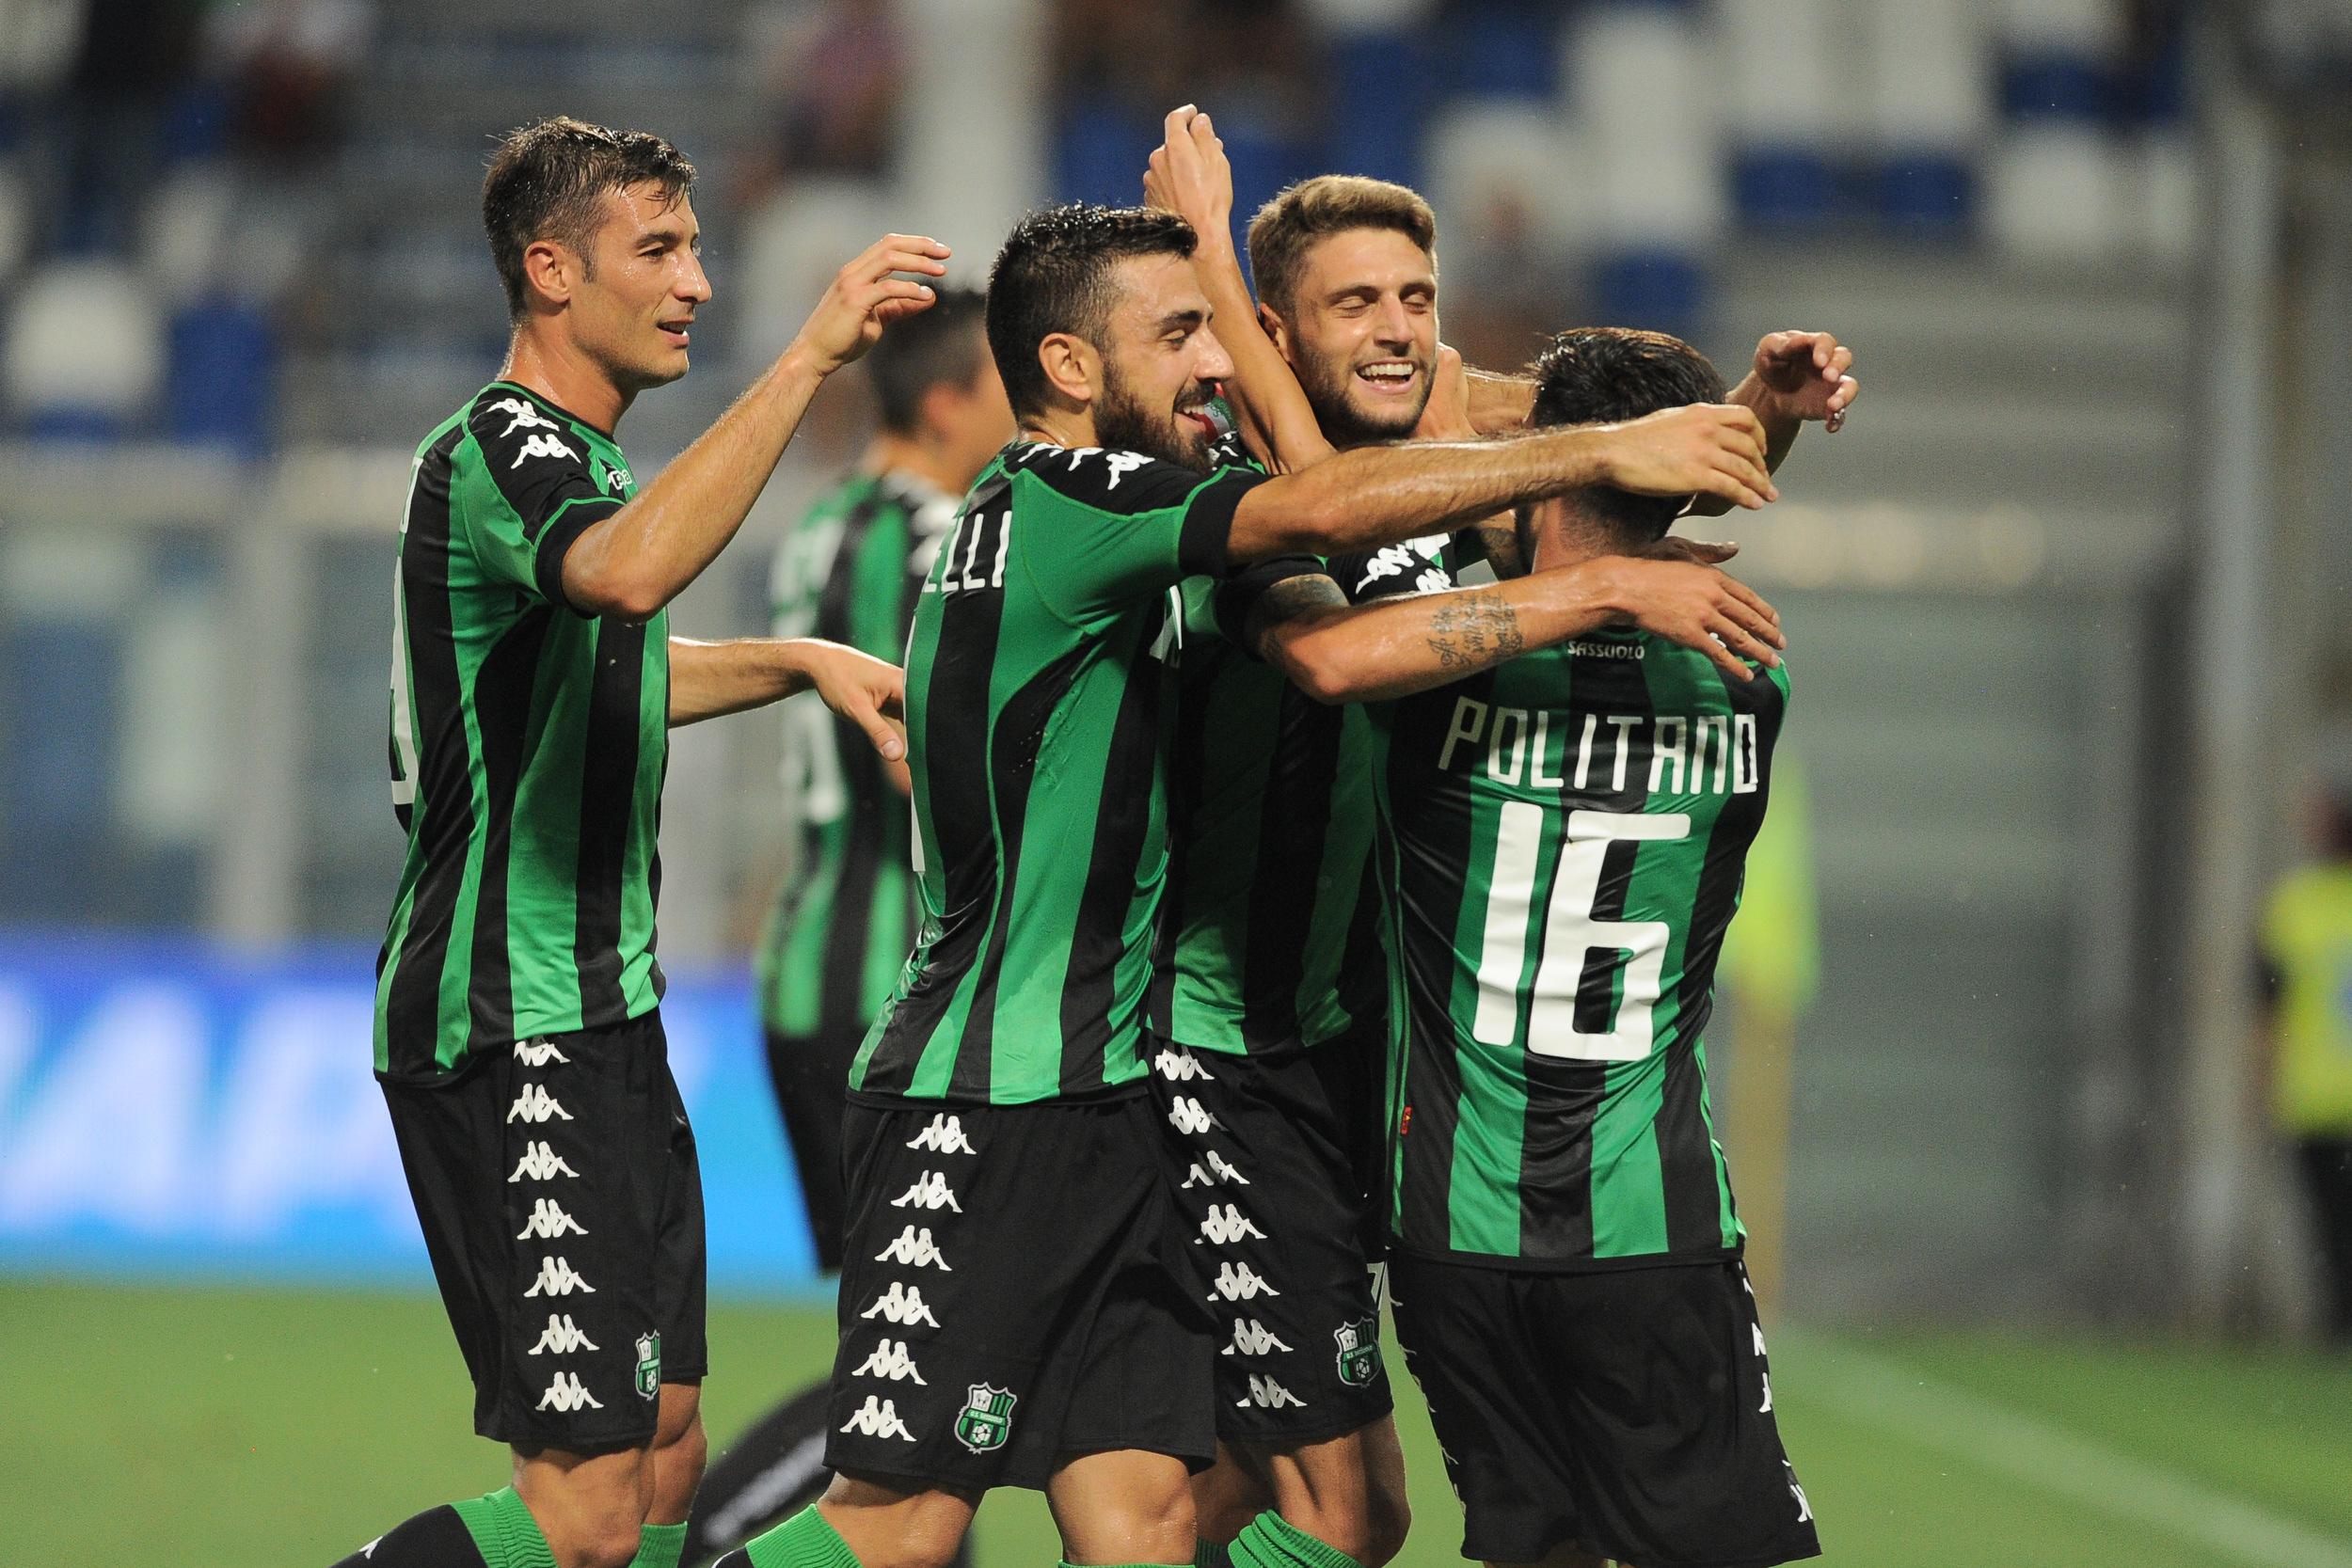 Ranking uefa il sassuolo spinge l 39 italia verso l 39 inghilterra - Sassuolo italia ...